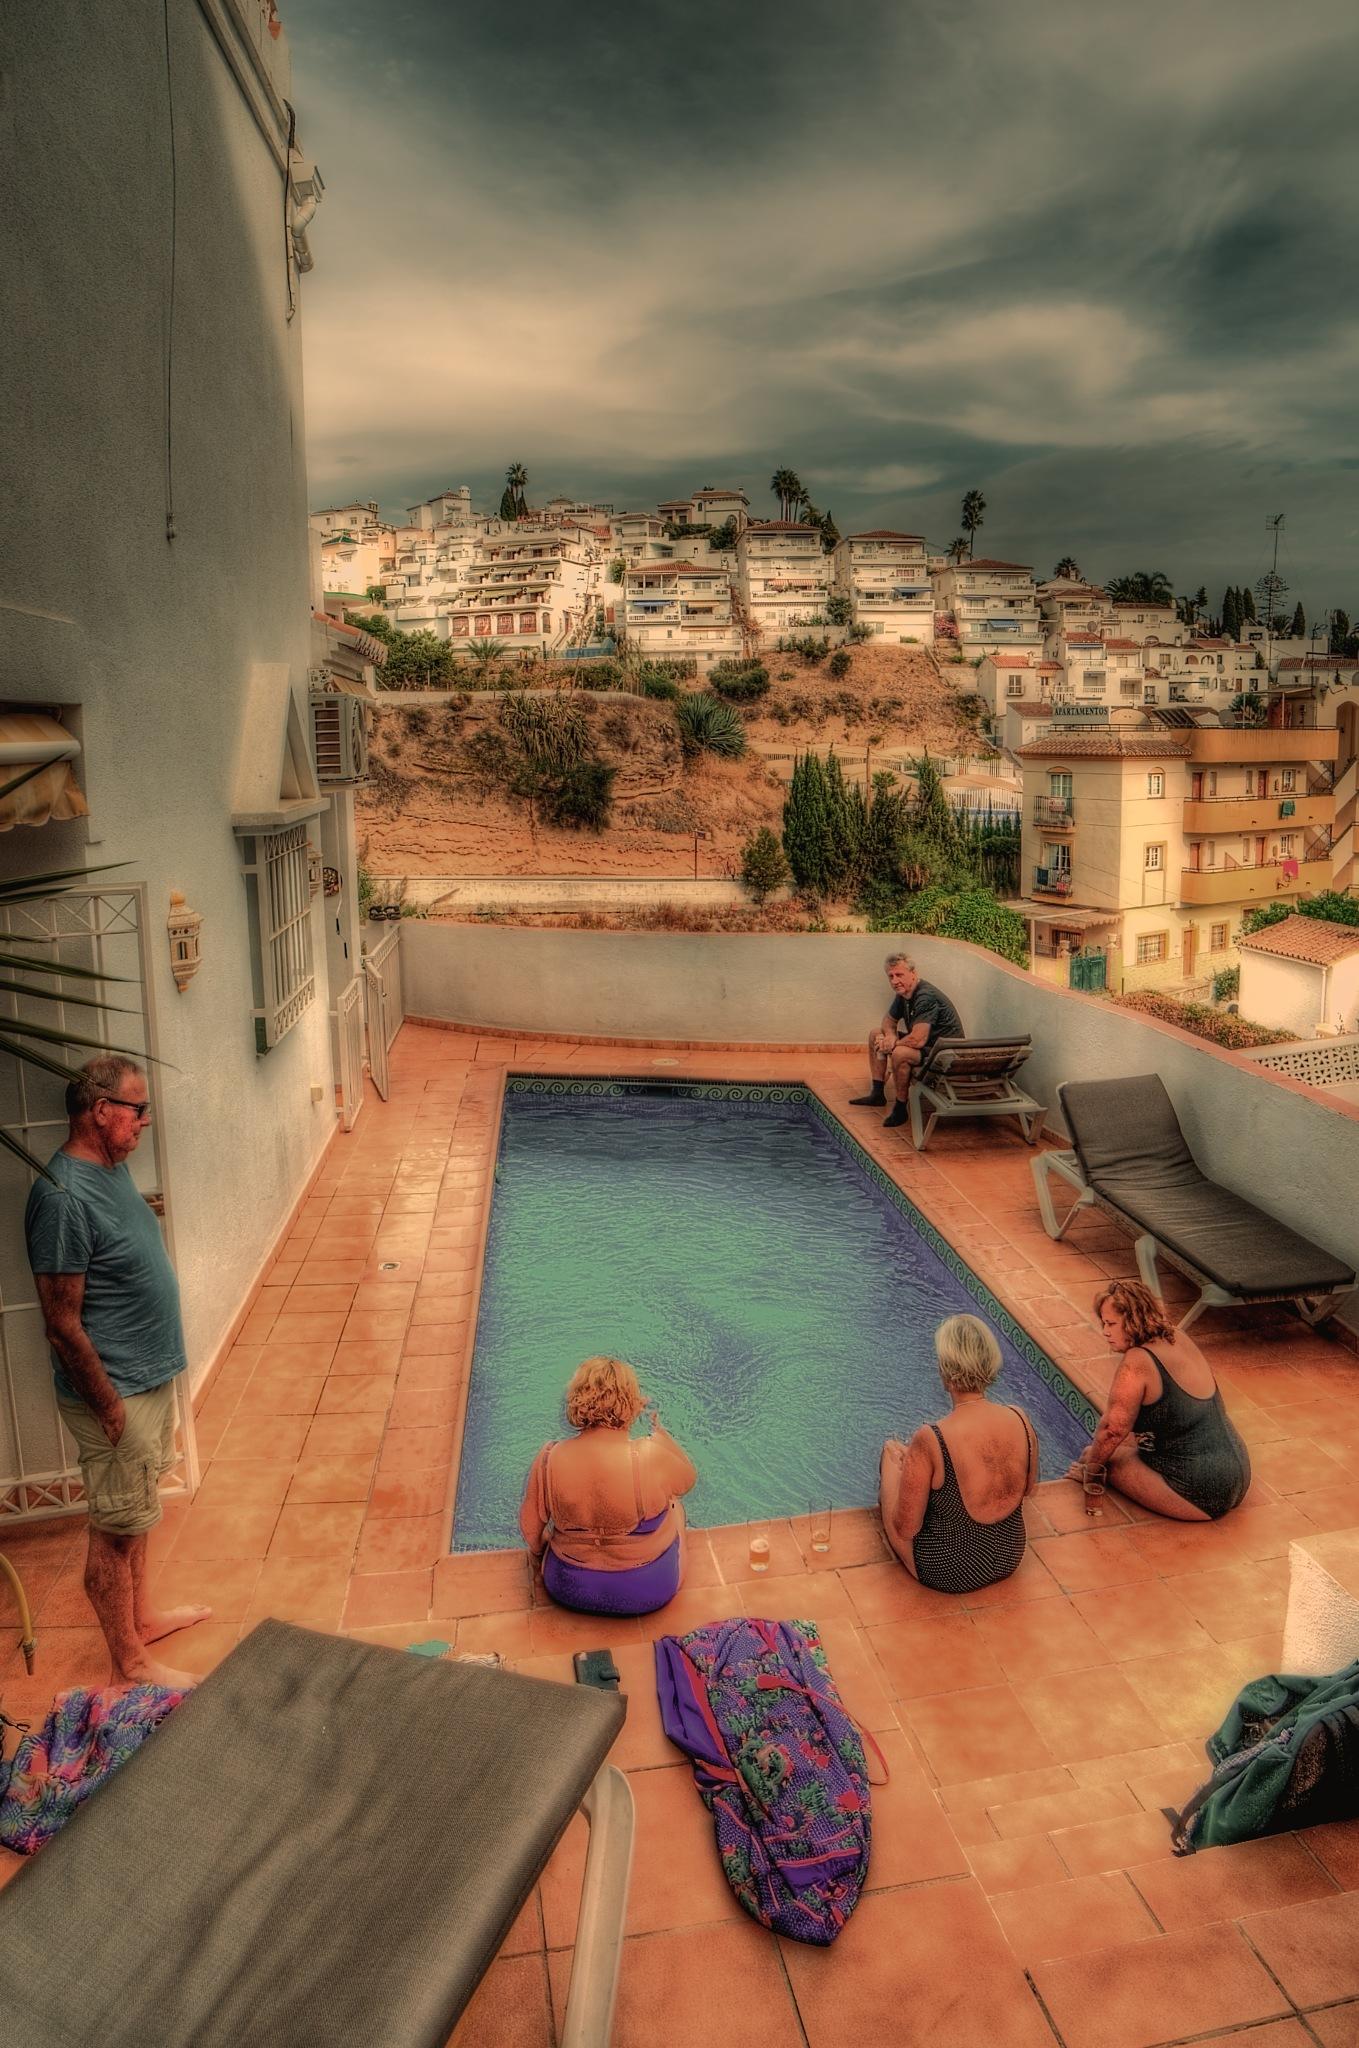 Sitting By The Pool by Bo Kärker